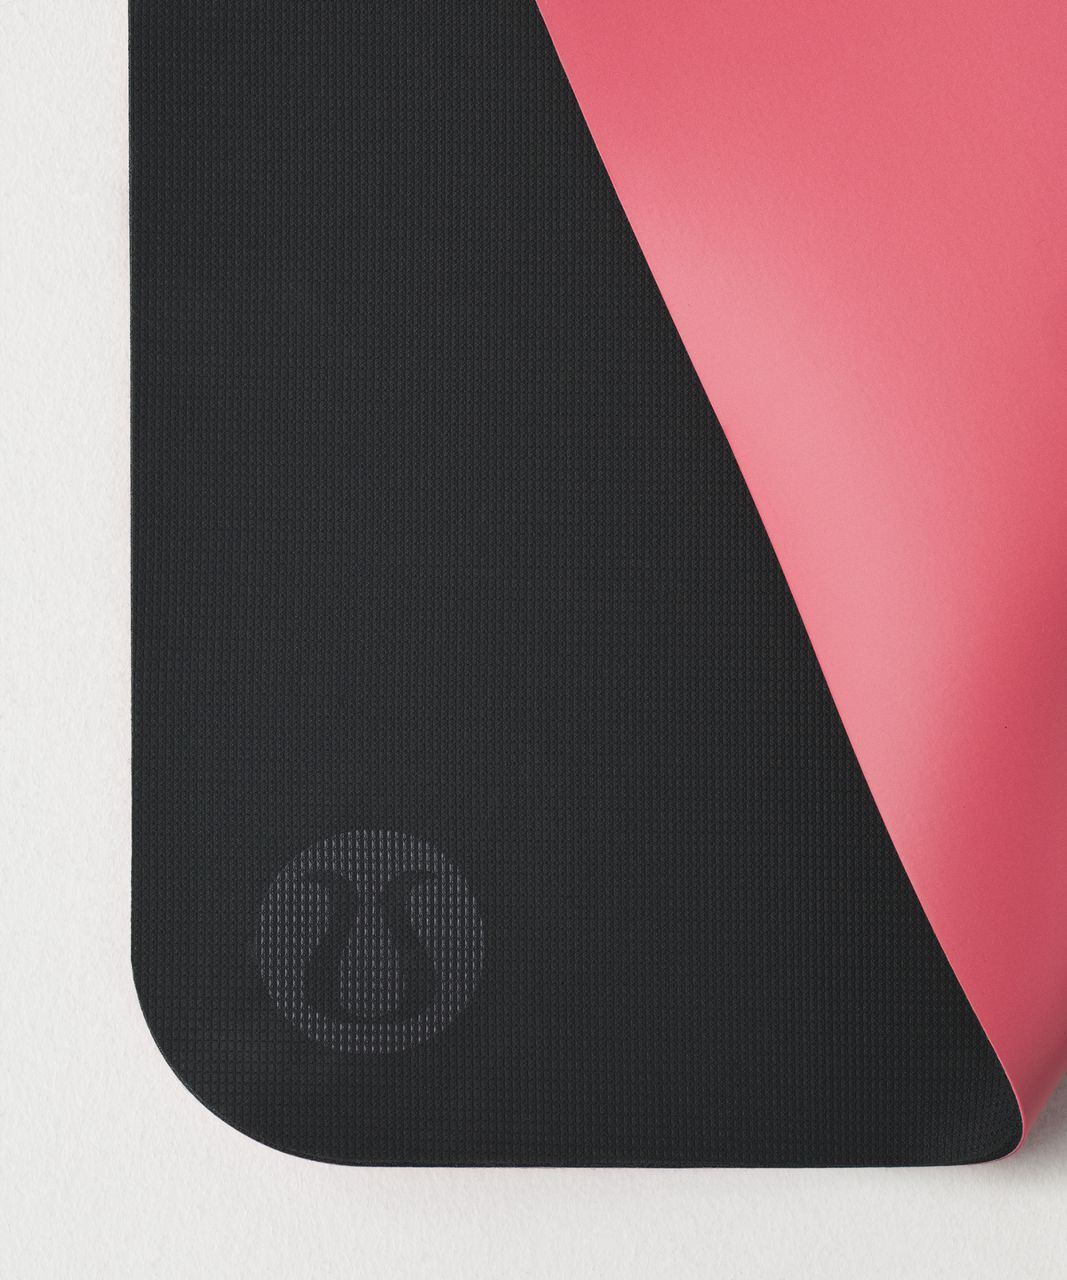 Lululemon The Reversible Mat 5mm - Pink Lemonade / Deep Coal